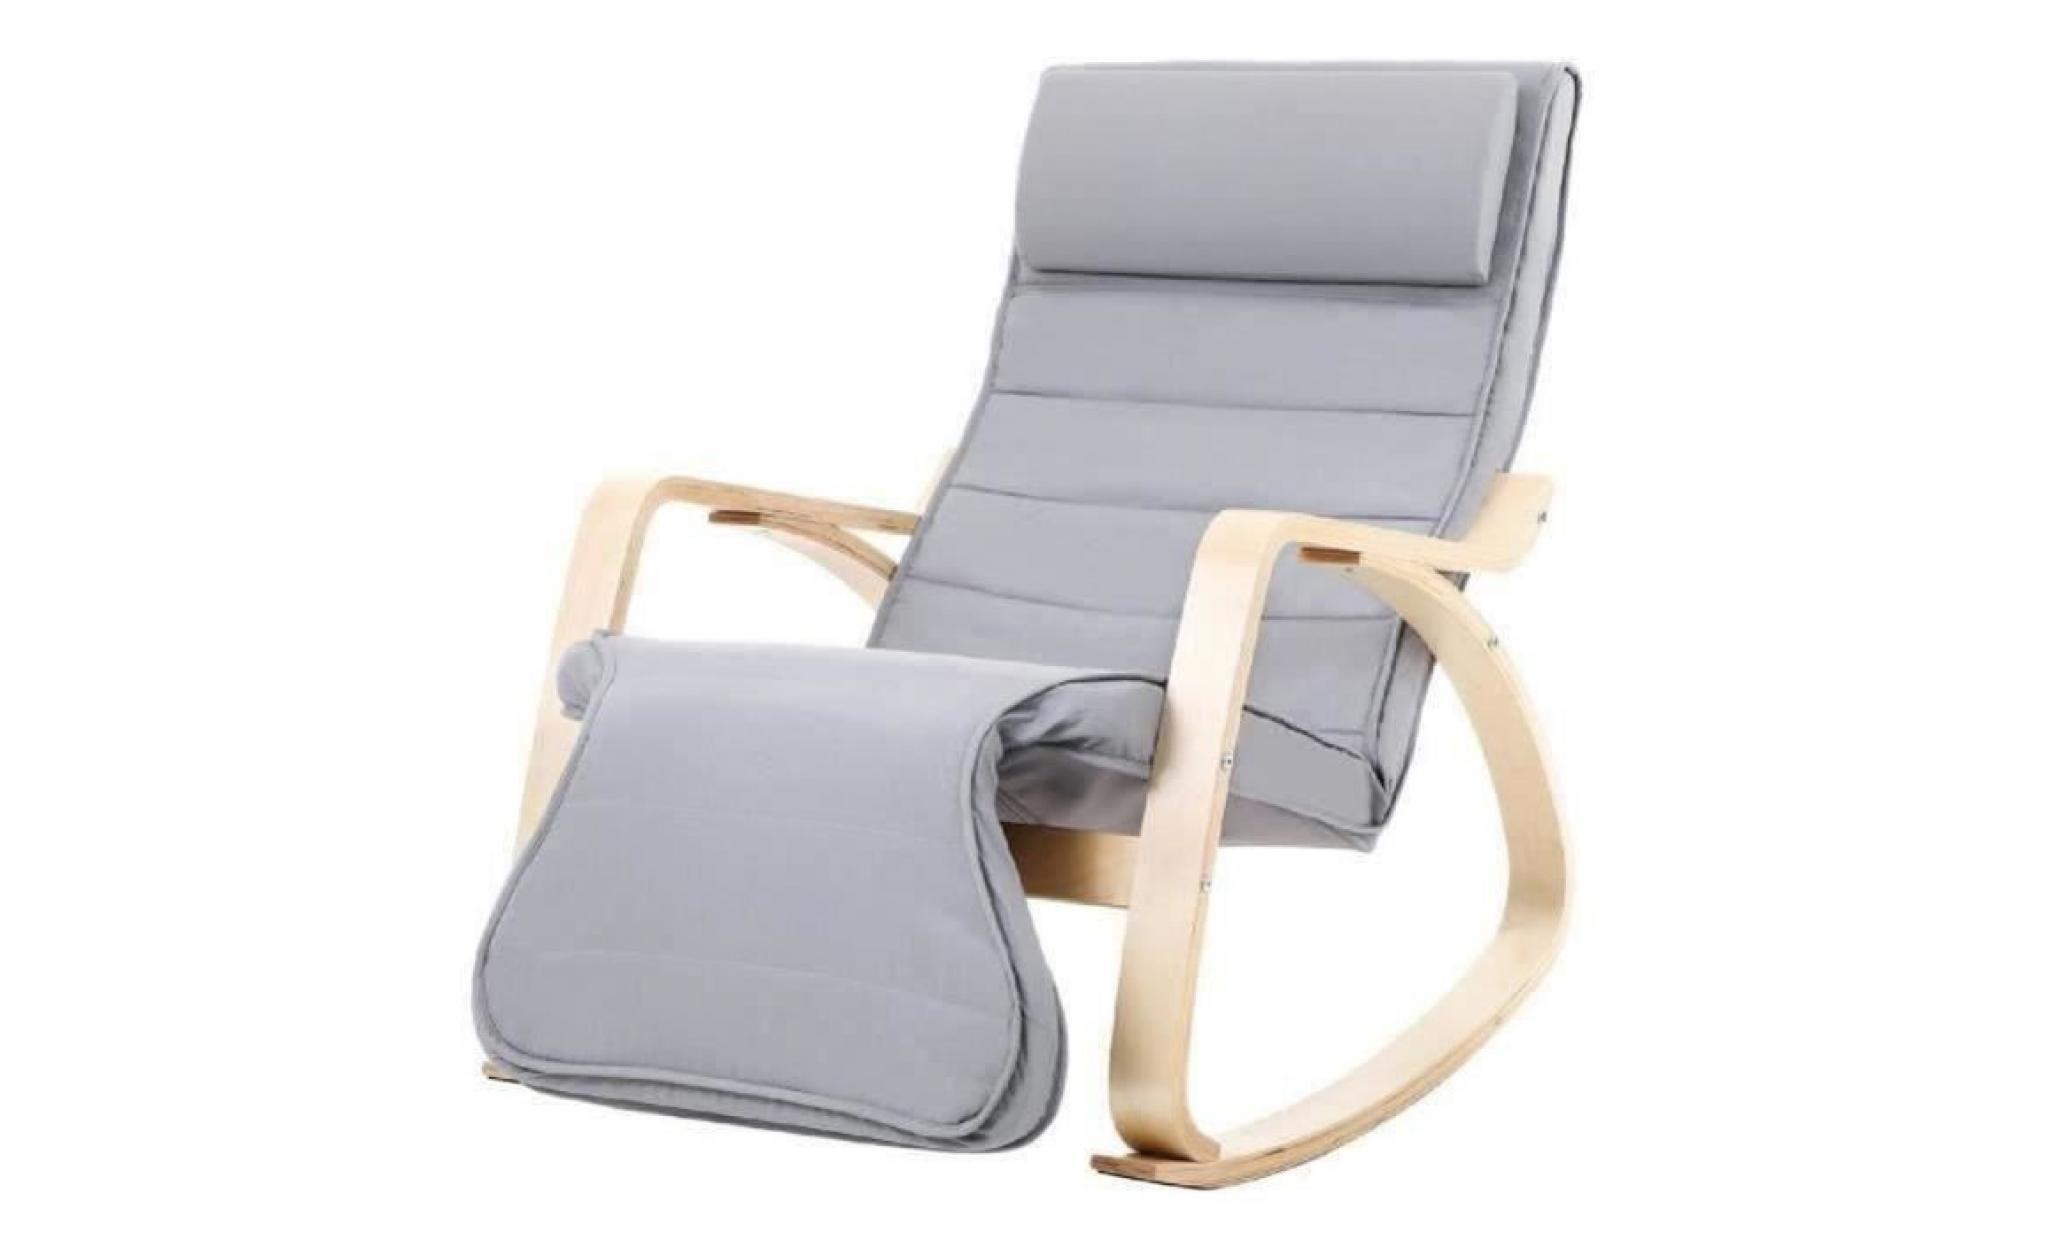 Songmics Fauteuil A Bascule Relaxant Rocking Chair Avec Repose Pied